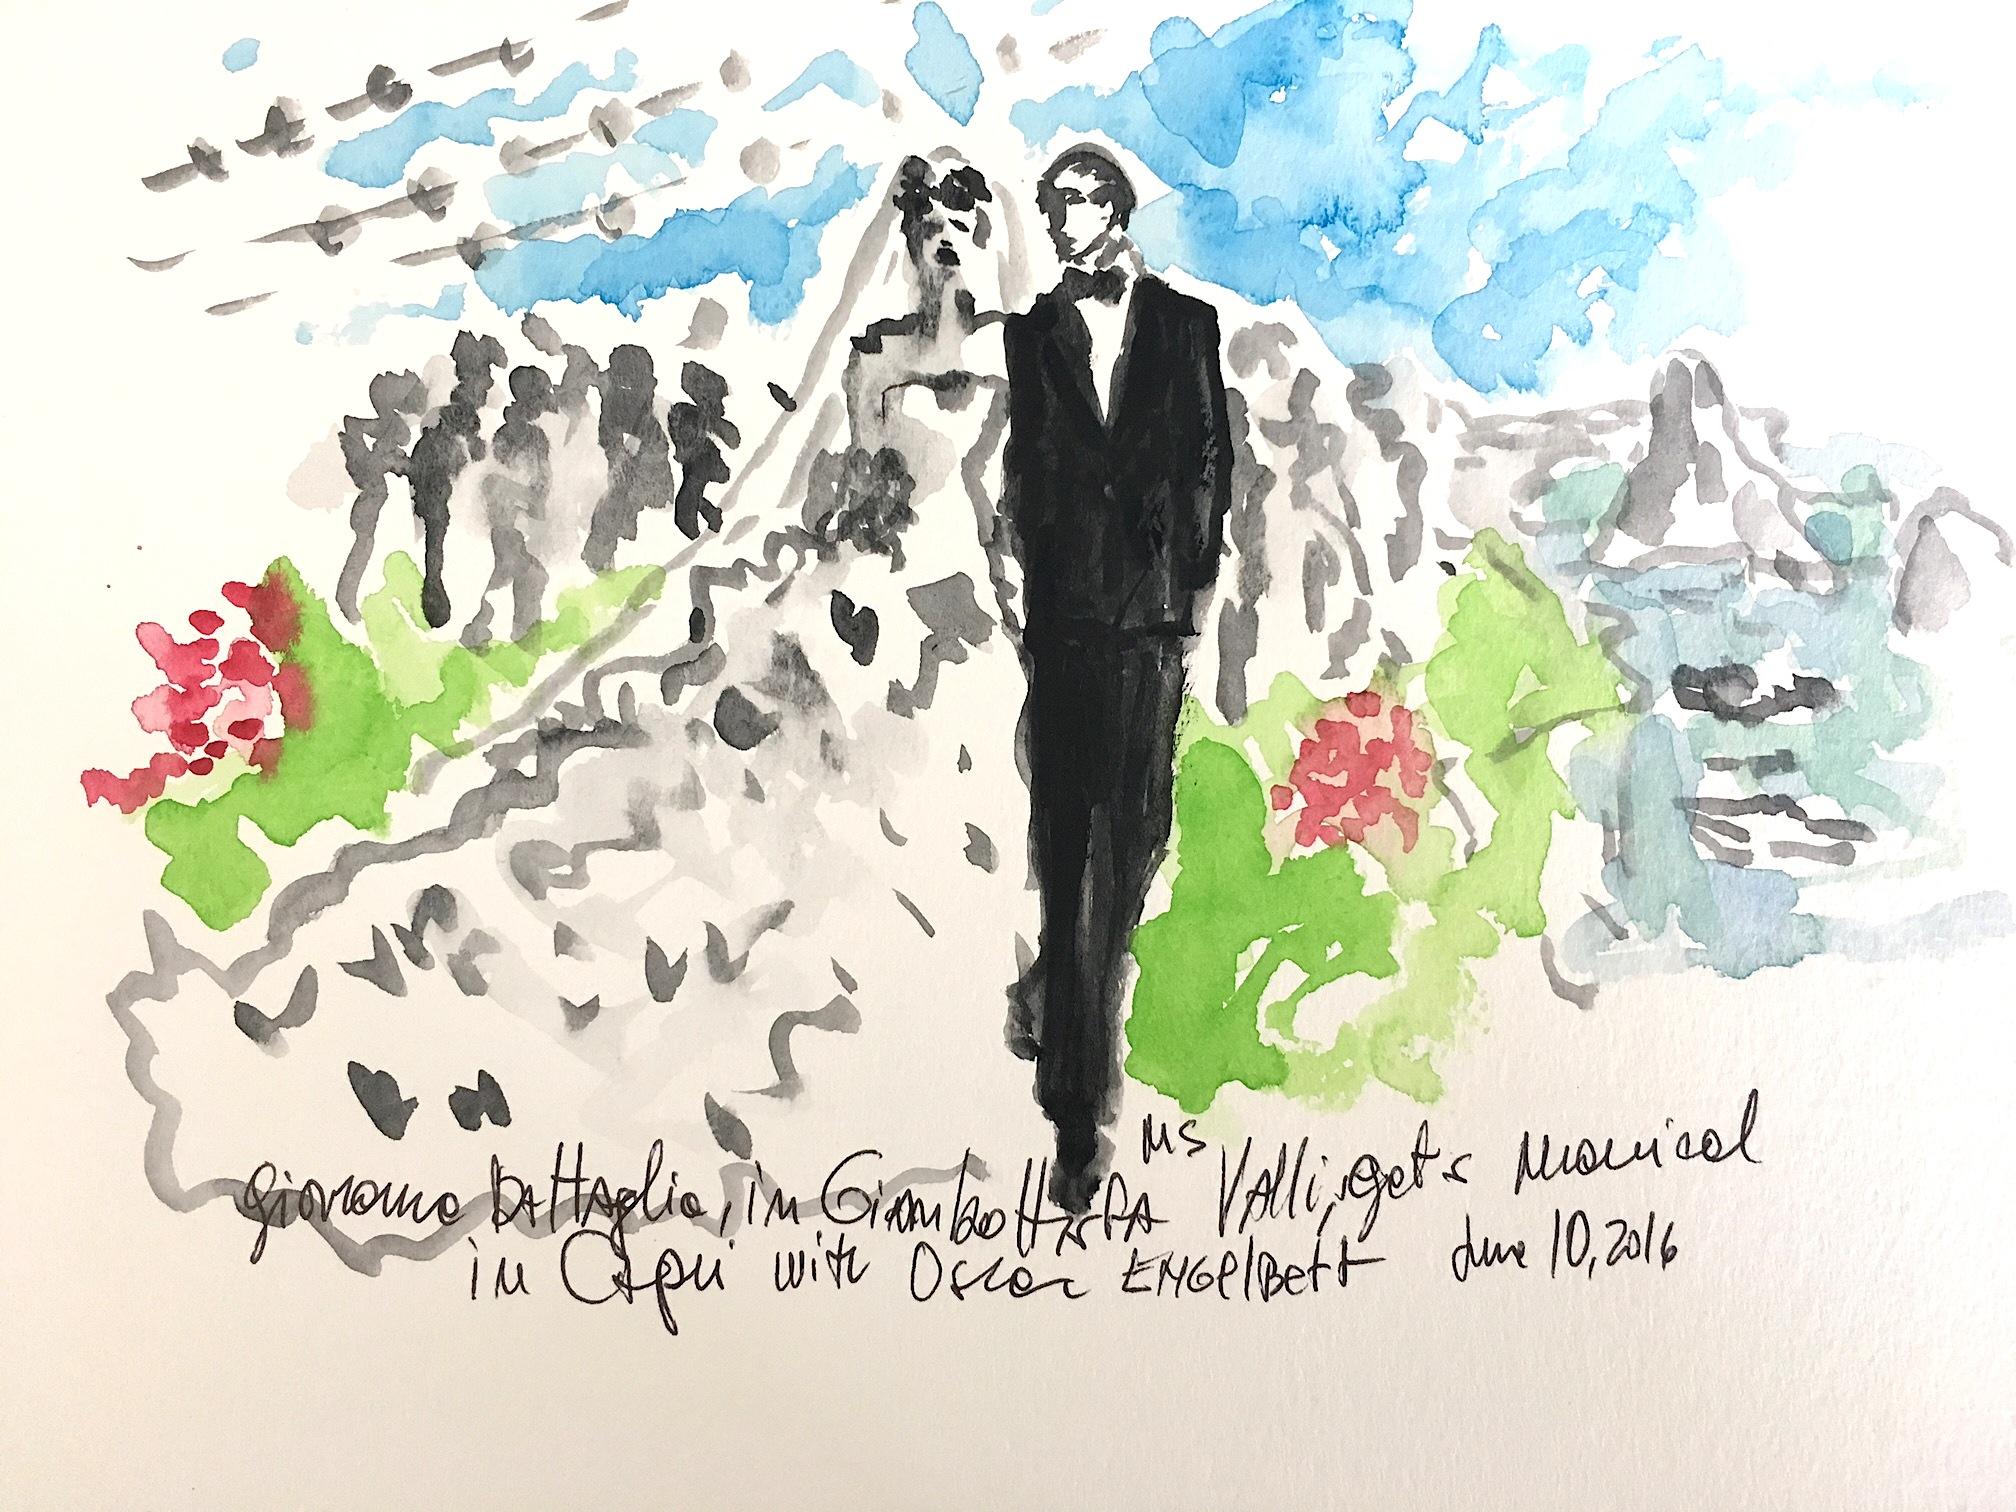 The wedding of Giovanna Battaglia,